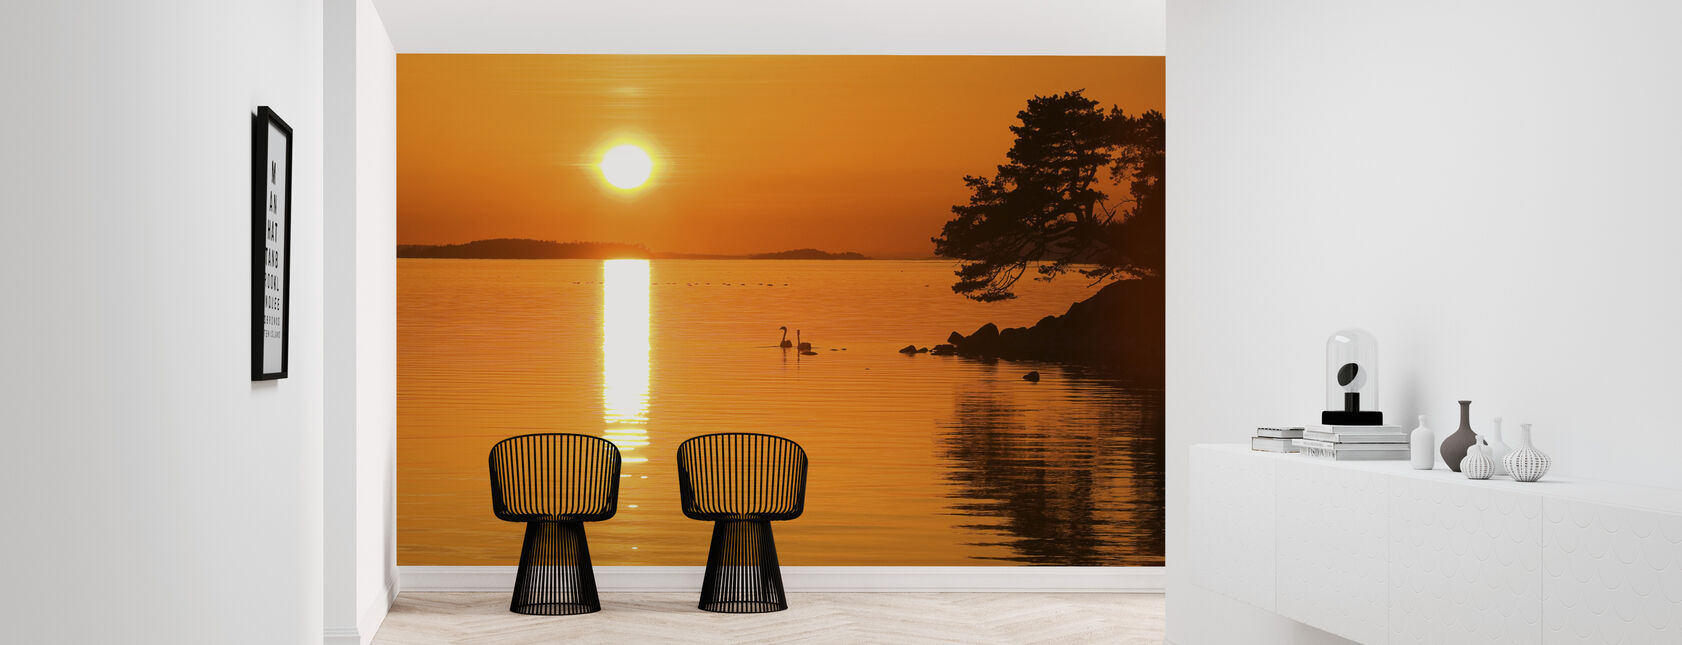 Sunrise Lake - Wallpaper - Hallway